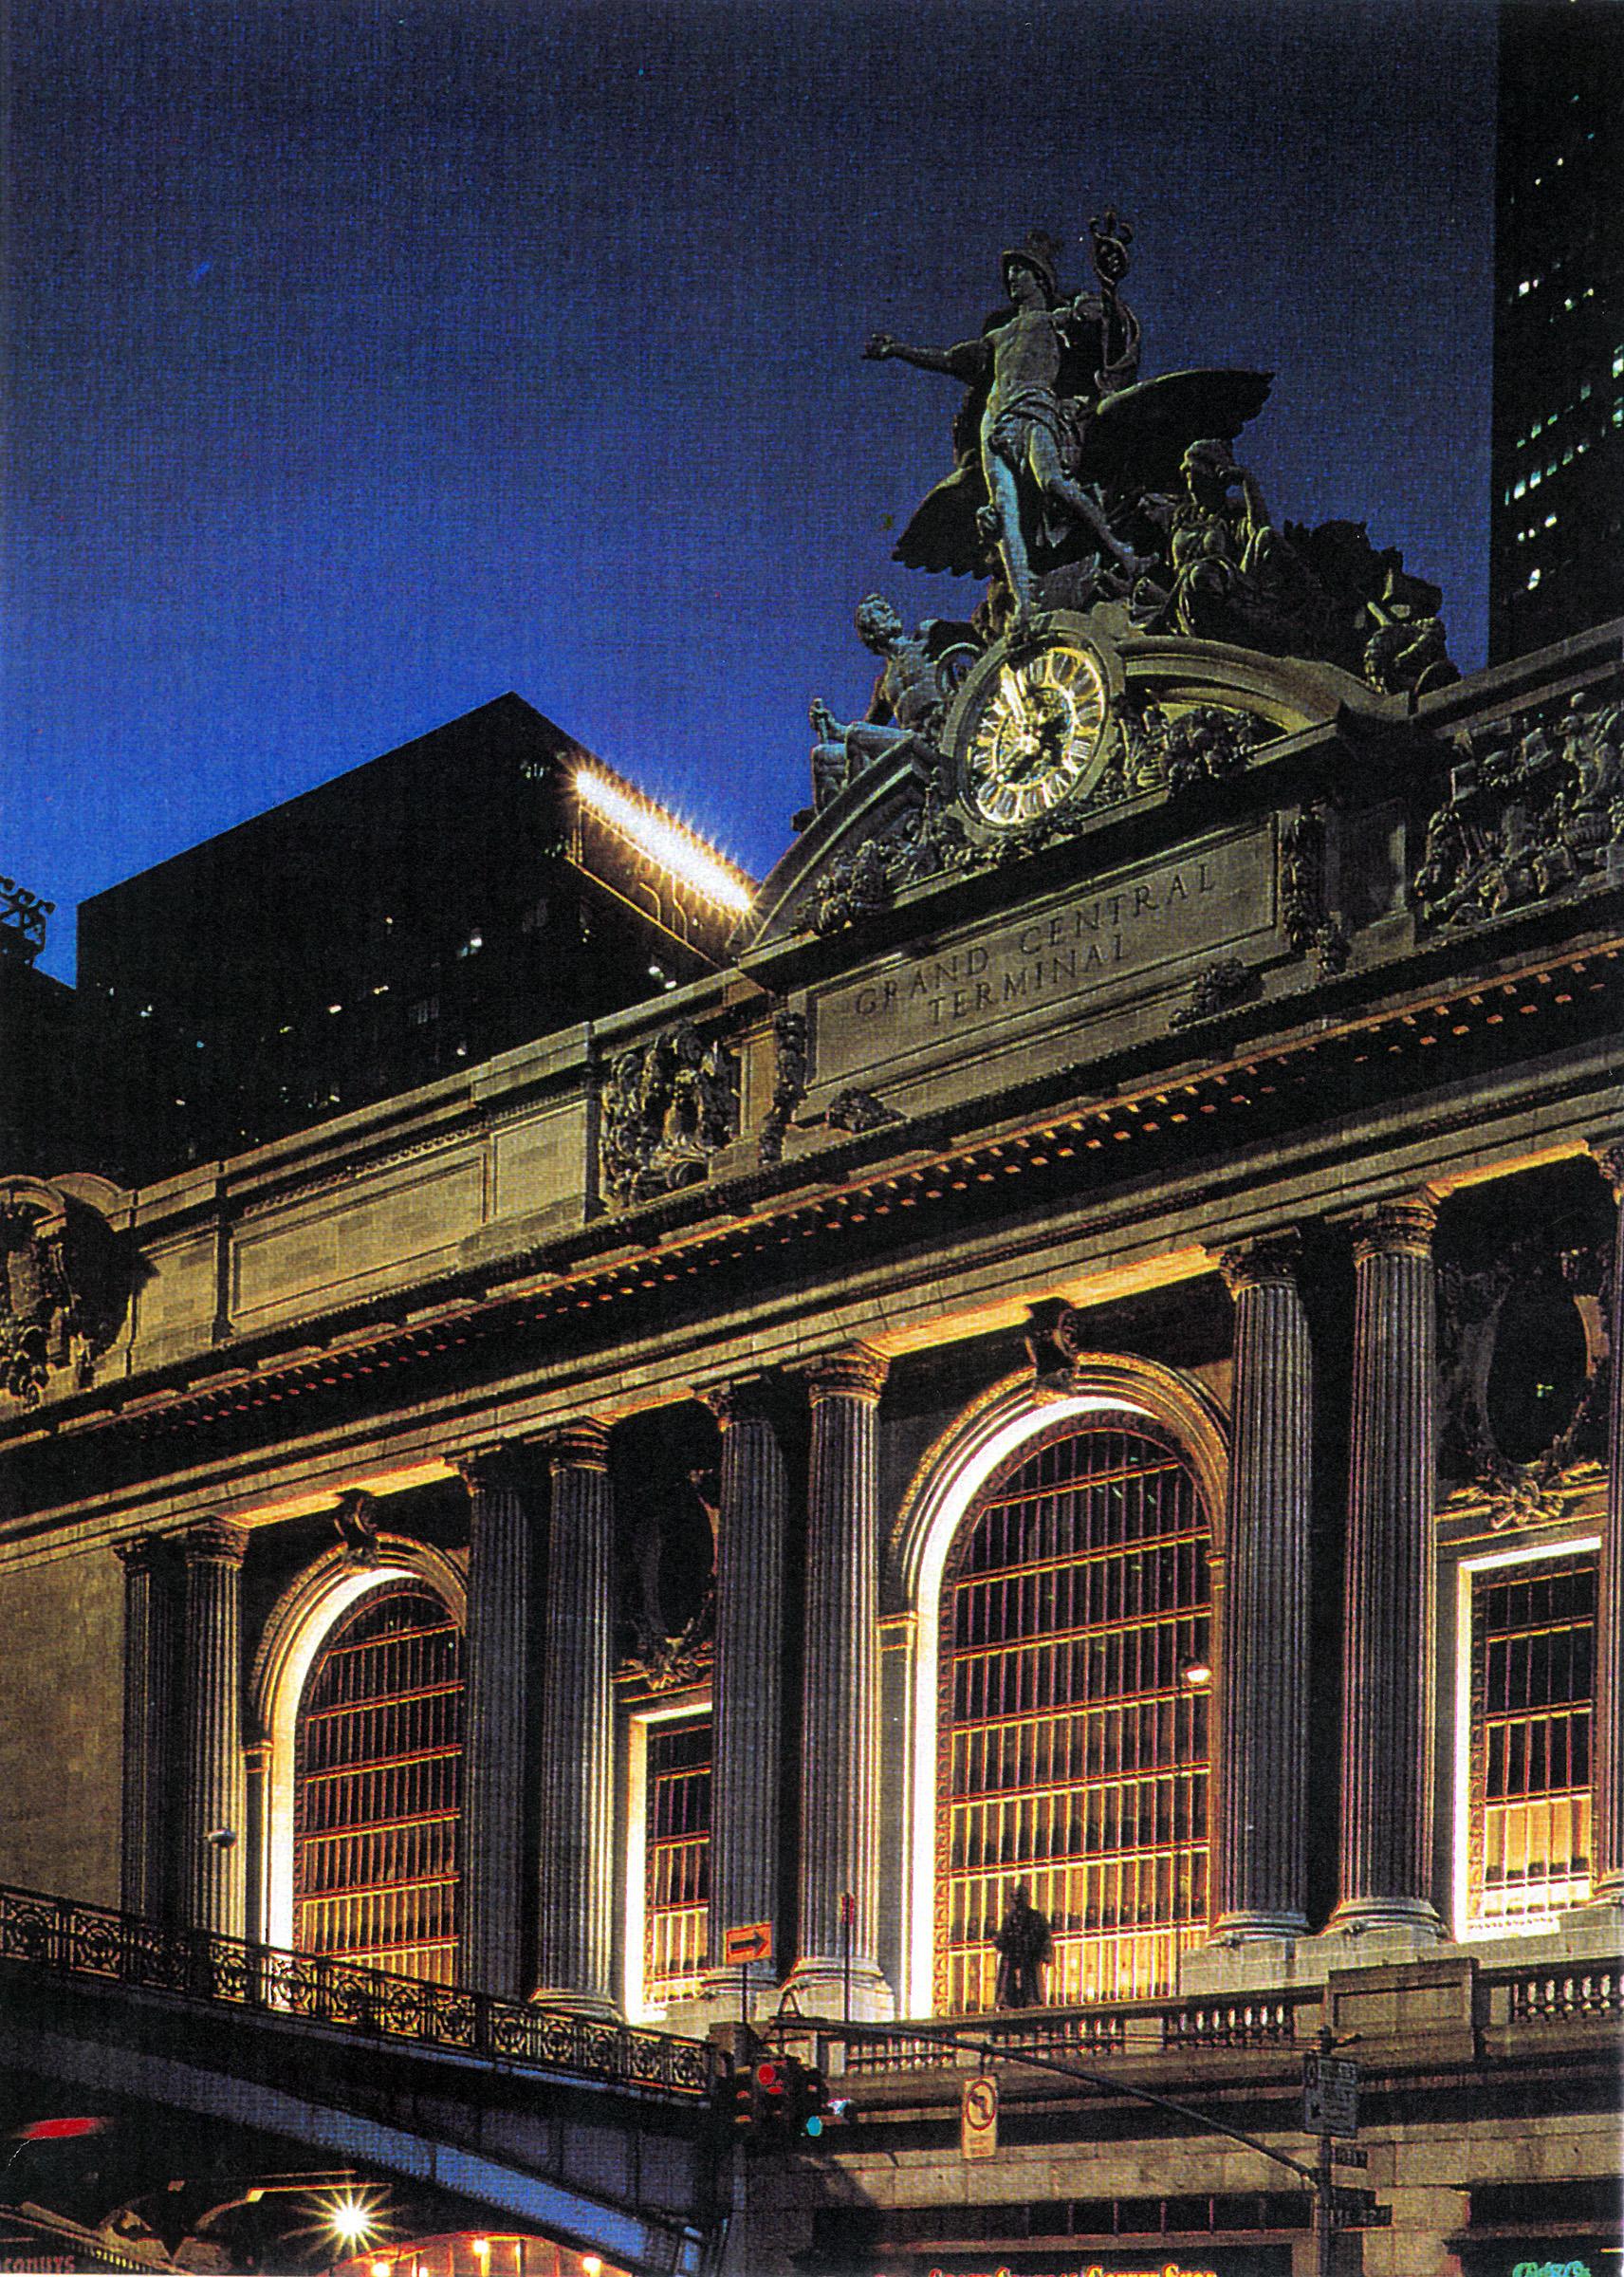 Grand Central Terminal Restoration